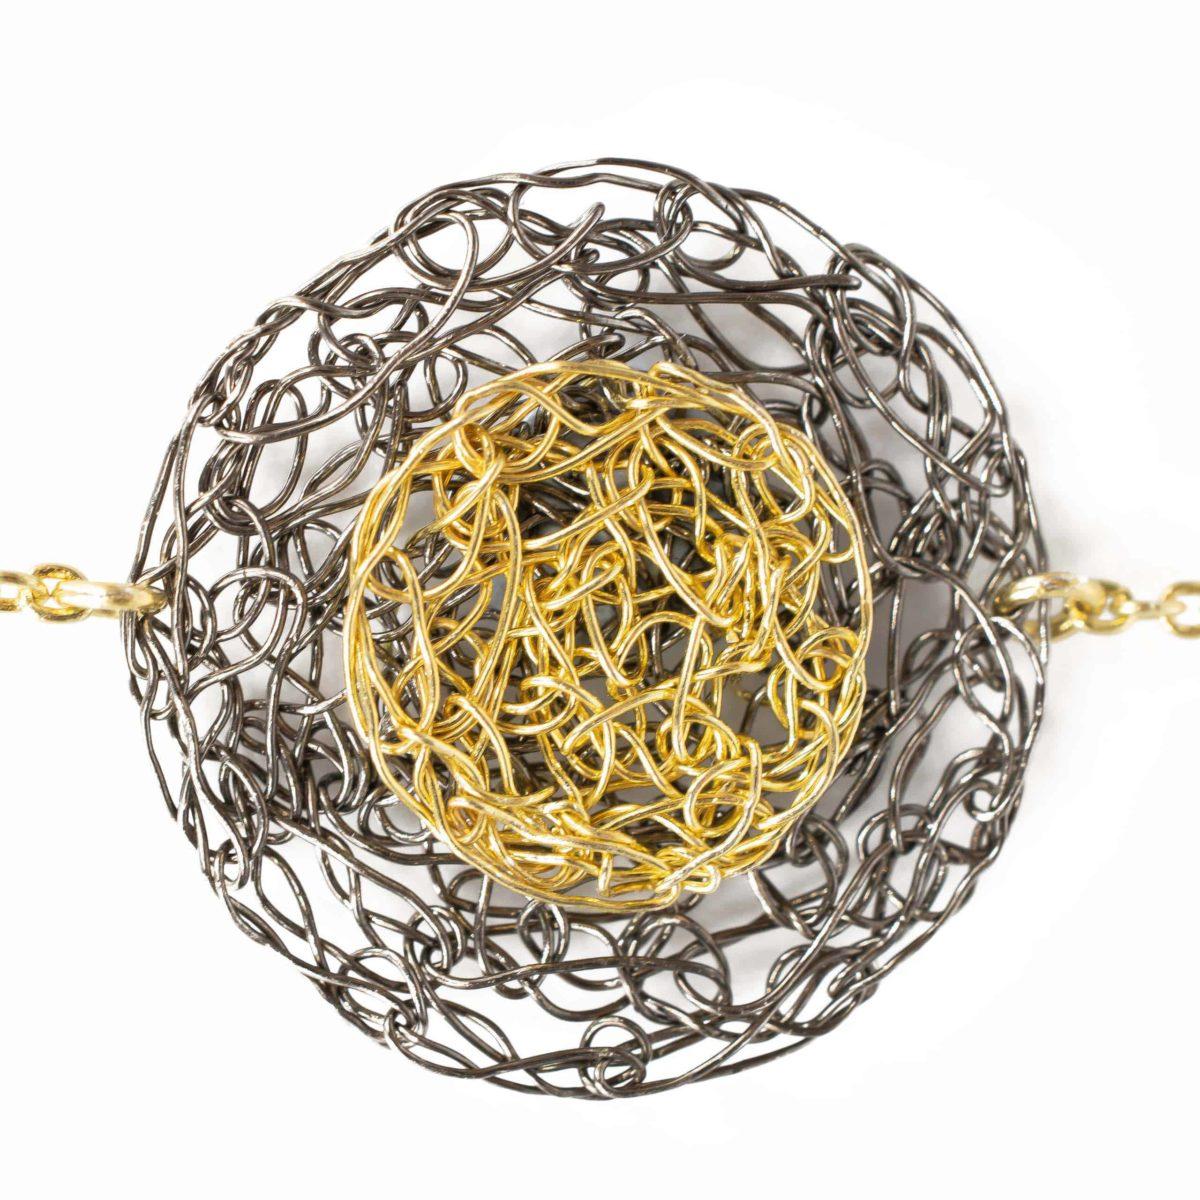 detail of charm bracelet in gold